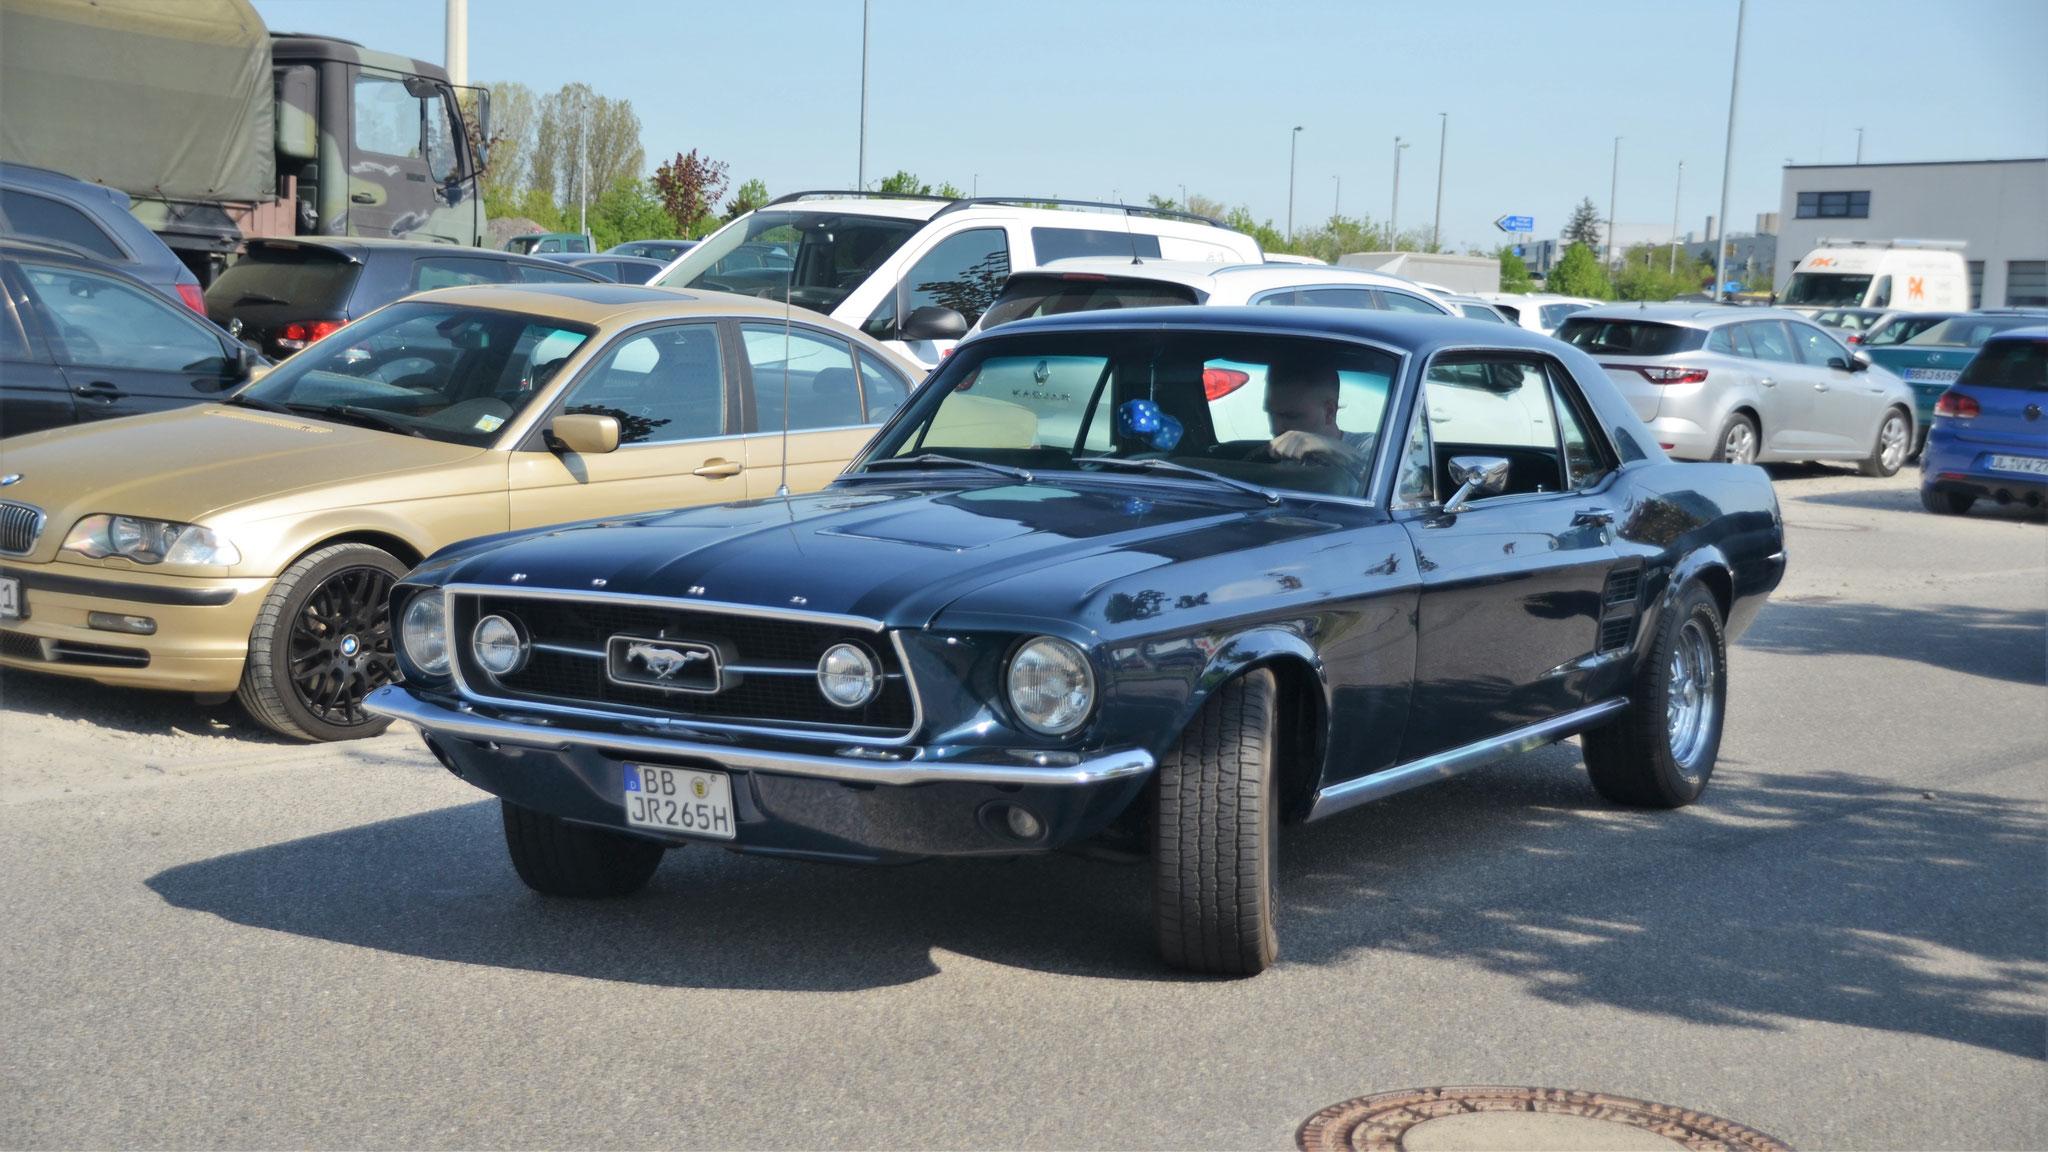 Mustang I - BB-JR-265H